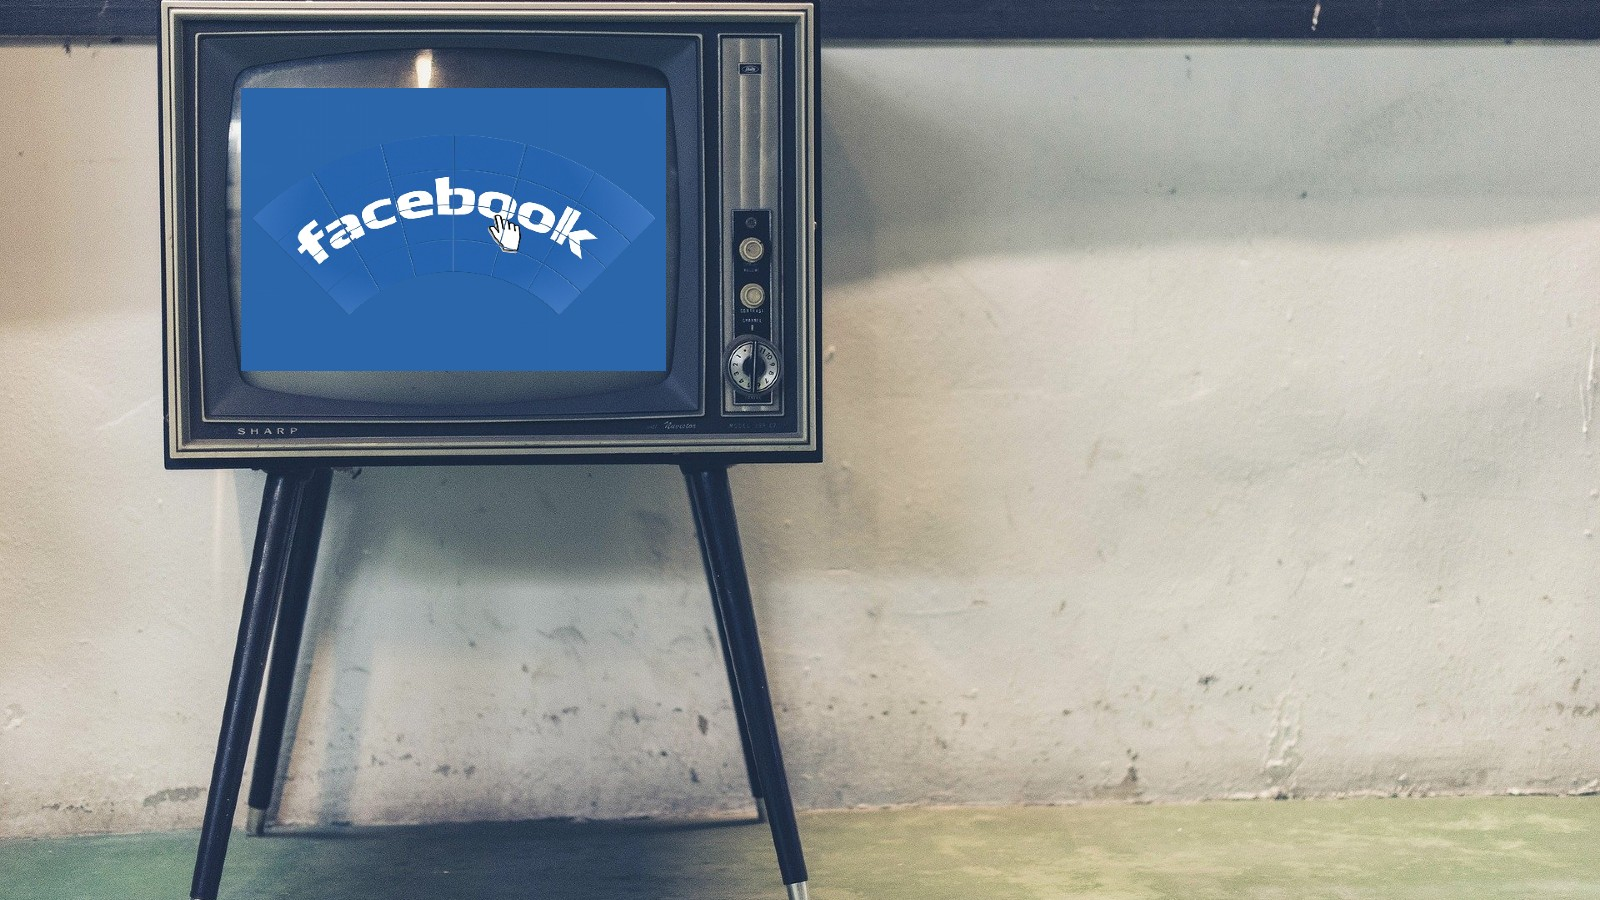 facebook outage - innovation issue - mediashotz